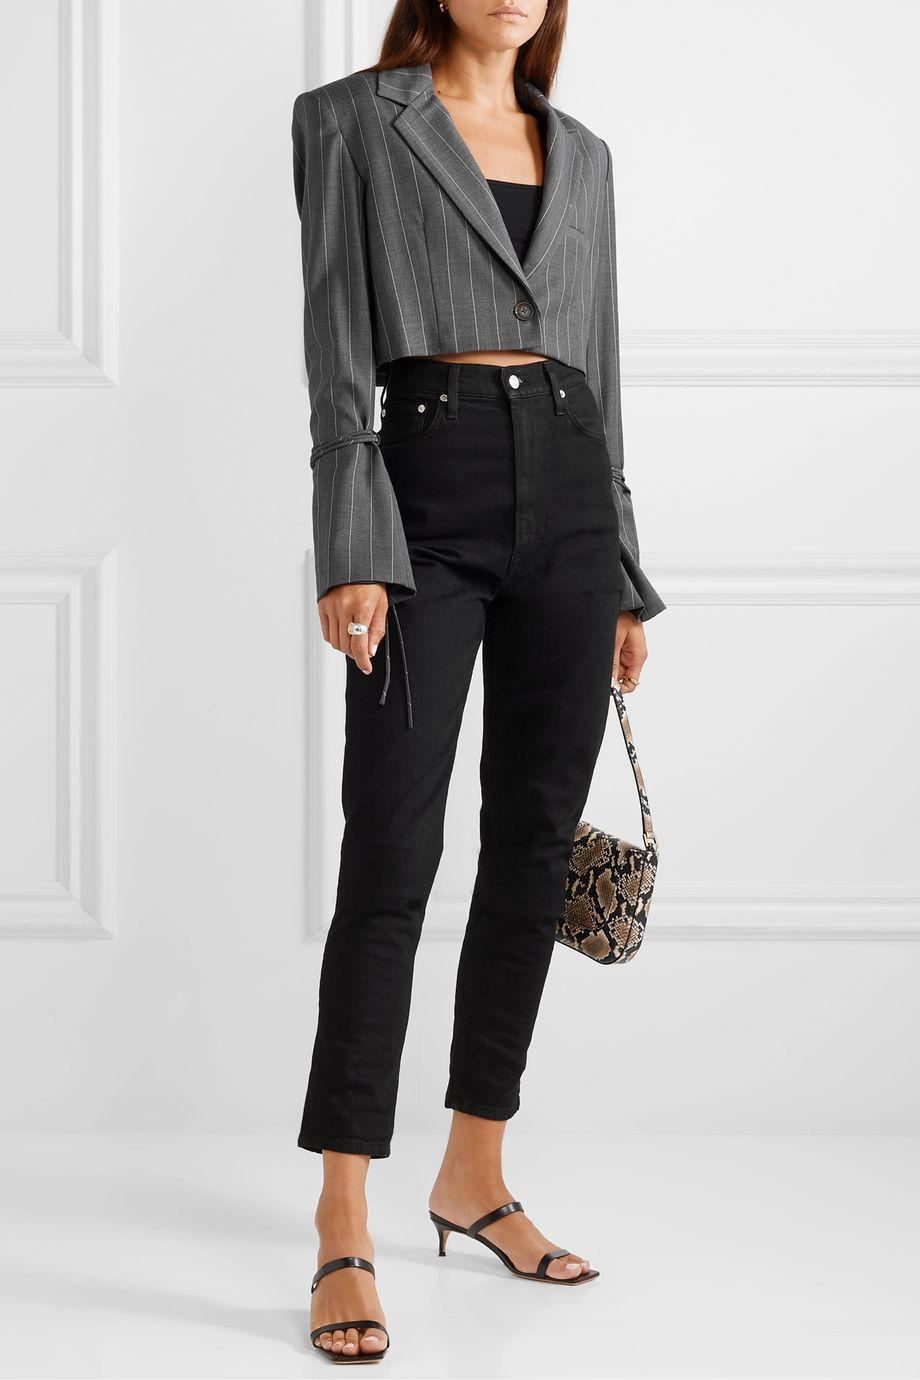 Orseund Iris Box 细条纹羊毛混纺短款西装外套